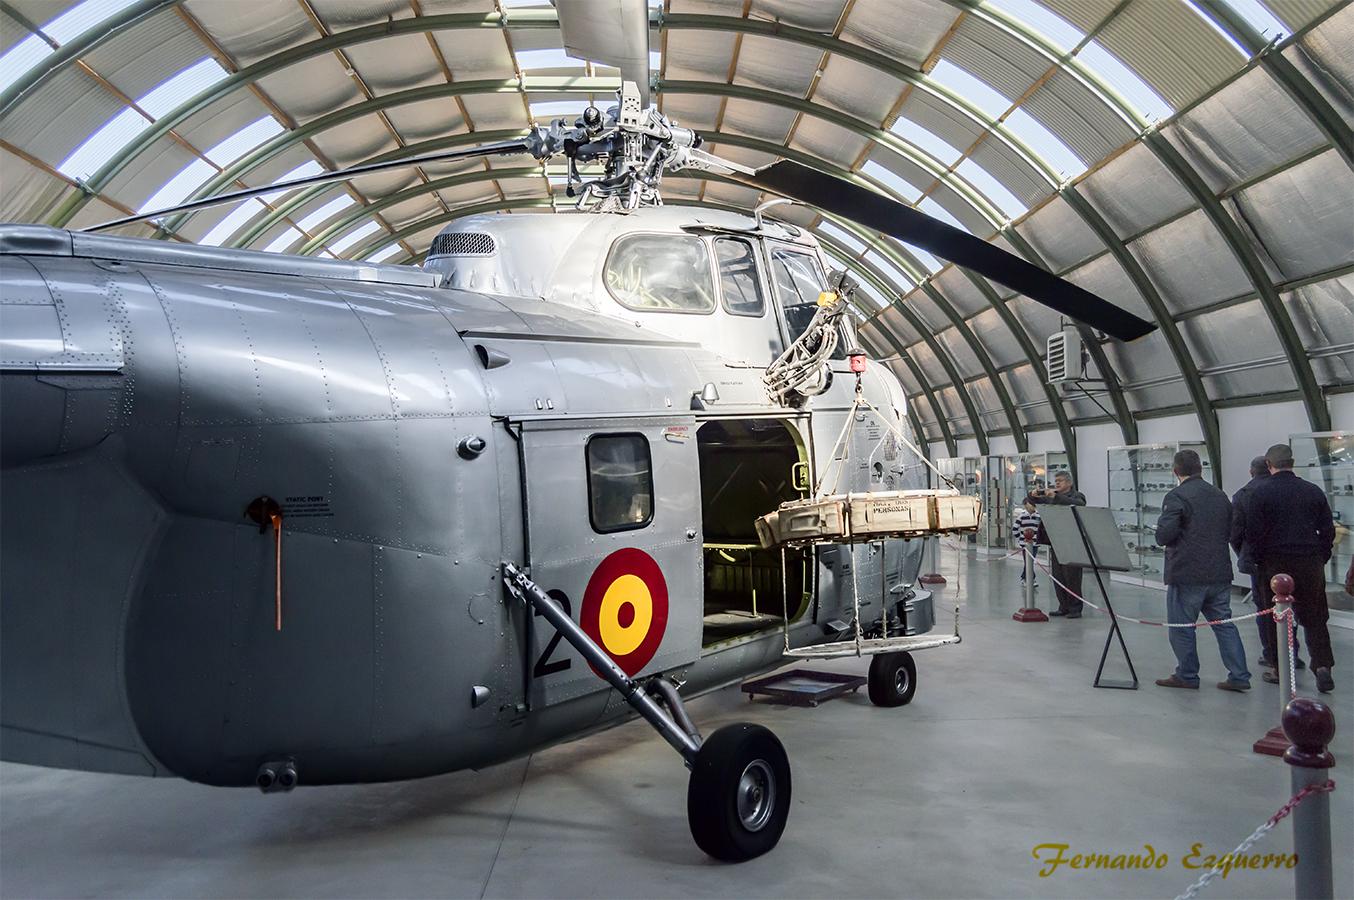 Sikorsky Westland S-55